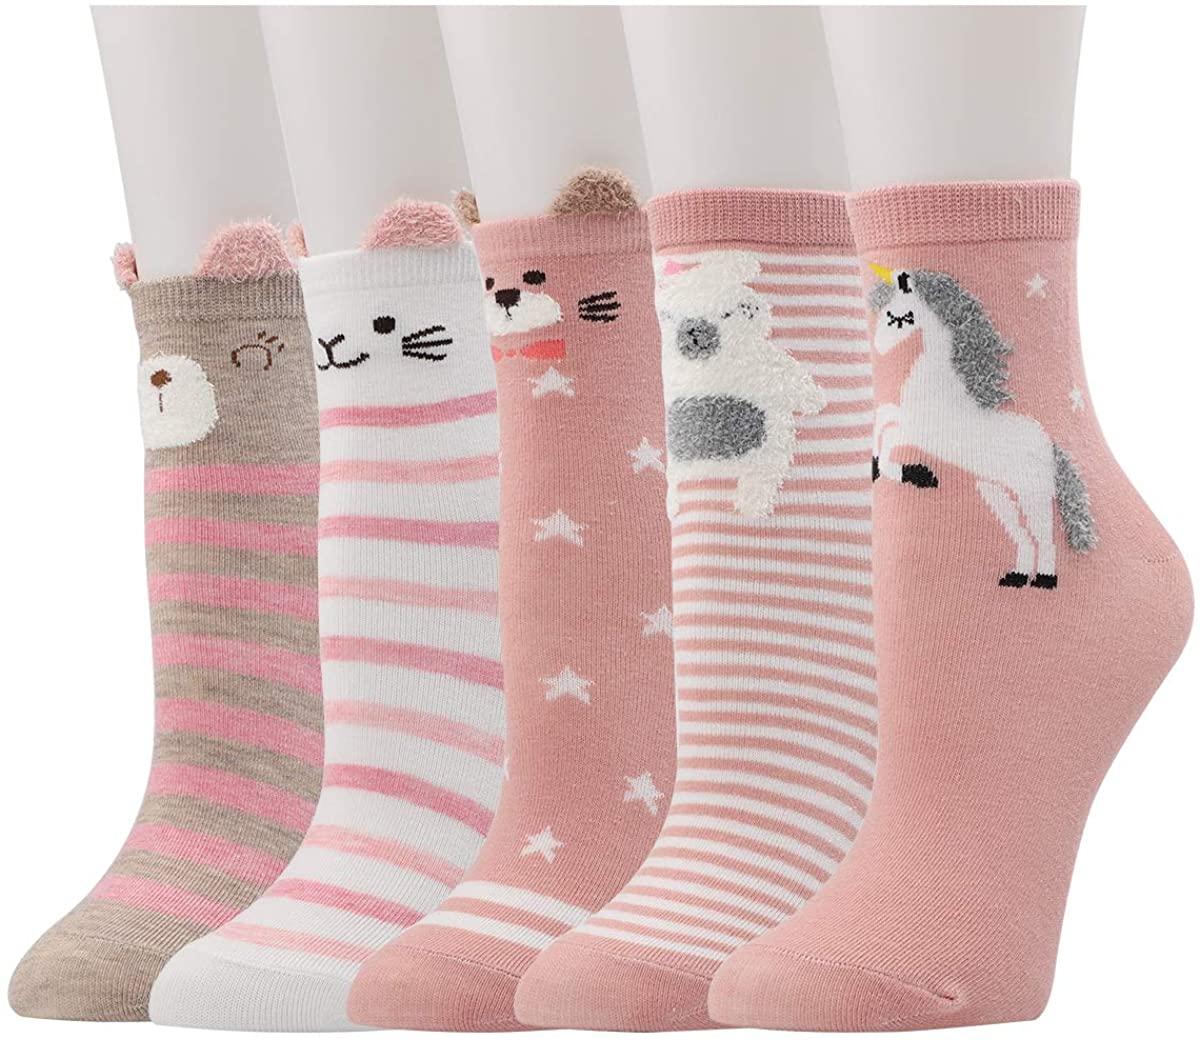 Dsaren 5 Pairs Cartoon Animal Socks Cute Cotton Casual Crew Socks Novelty Floor Socks for Women Girls Funny Gift